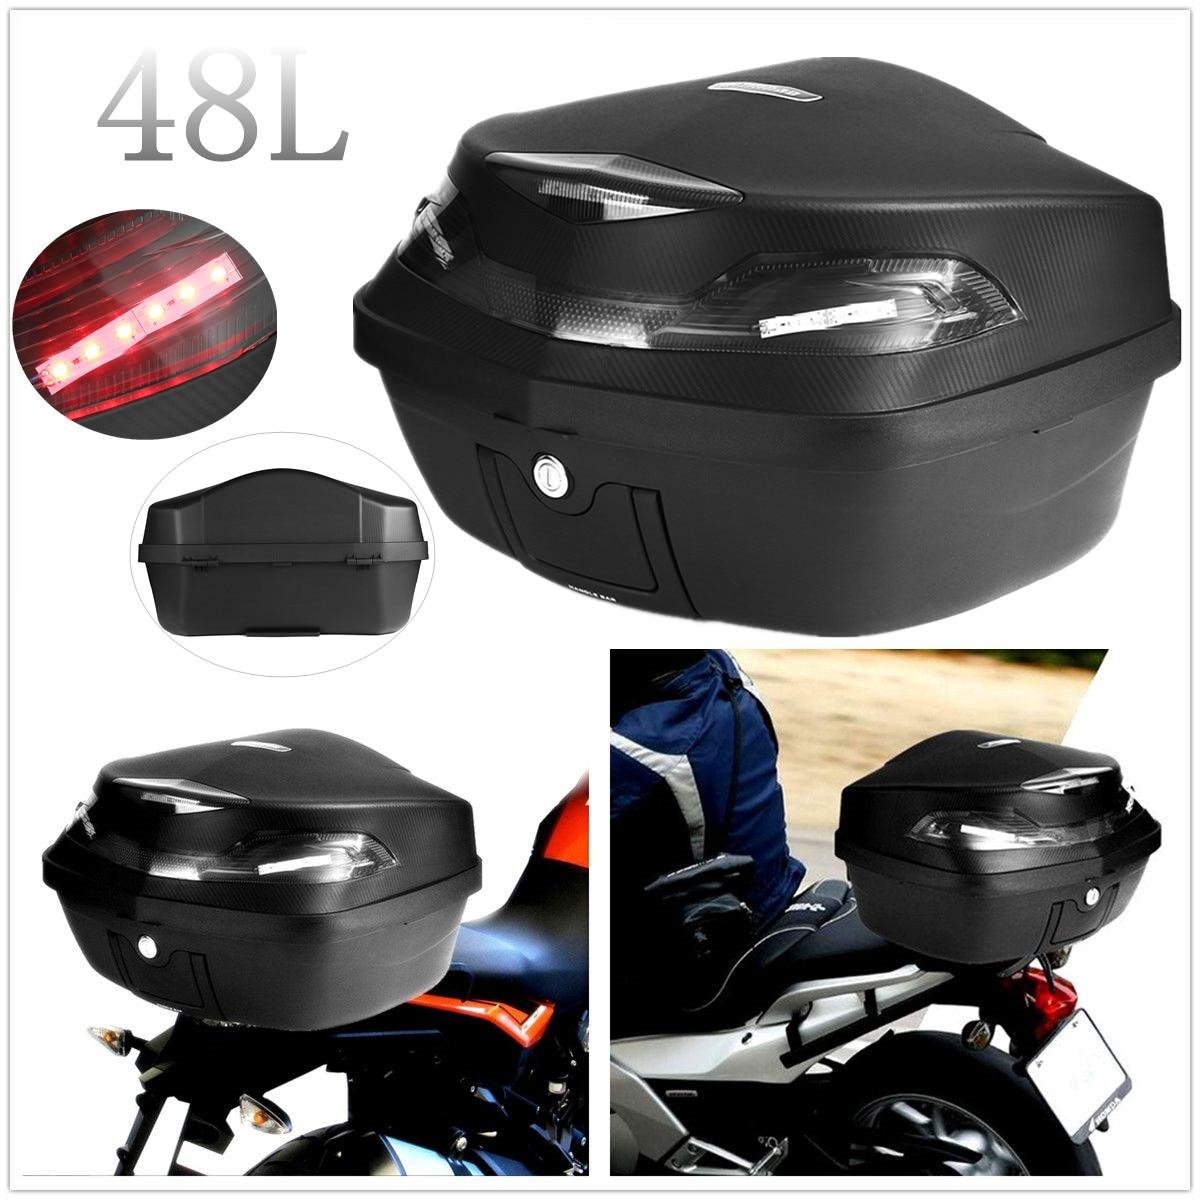 Universal 48L Motorcycle Rear Trunk Tail Storage Box Top Case W/Taillight For Honda/Yamaha/Suzuki/Harley